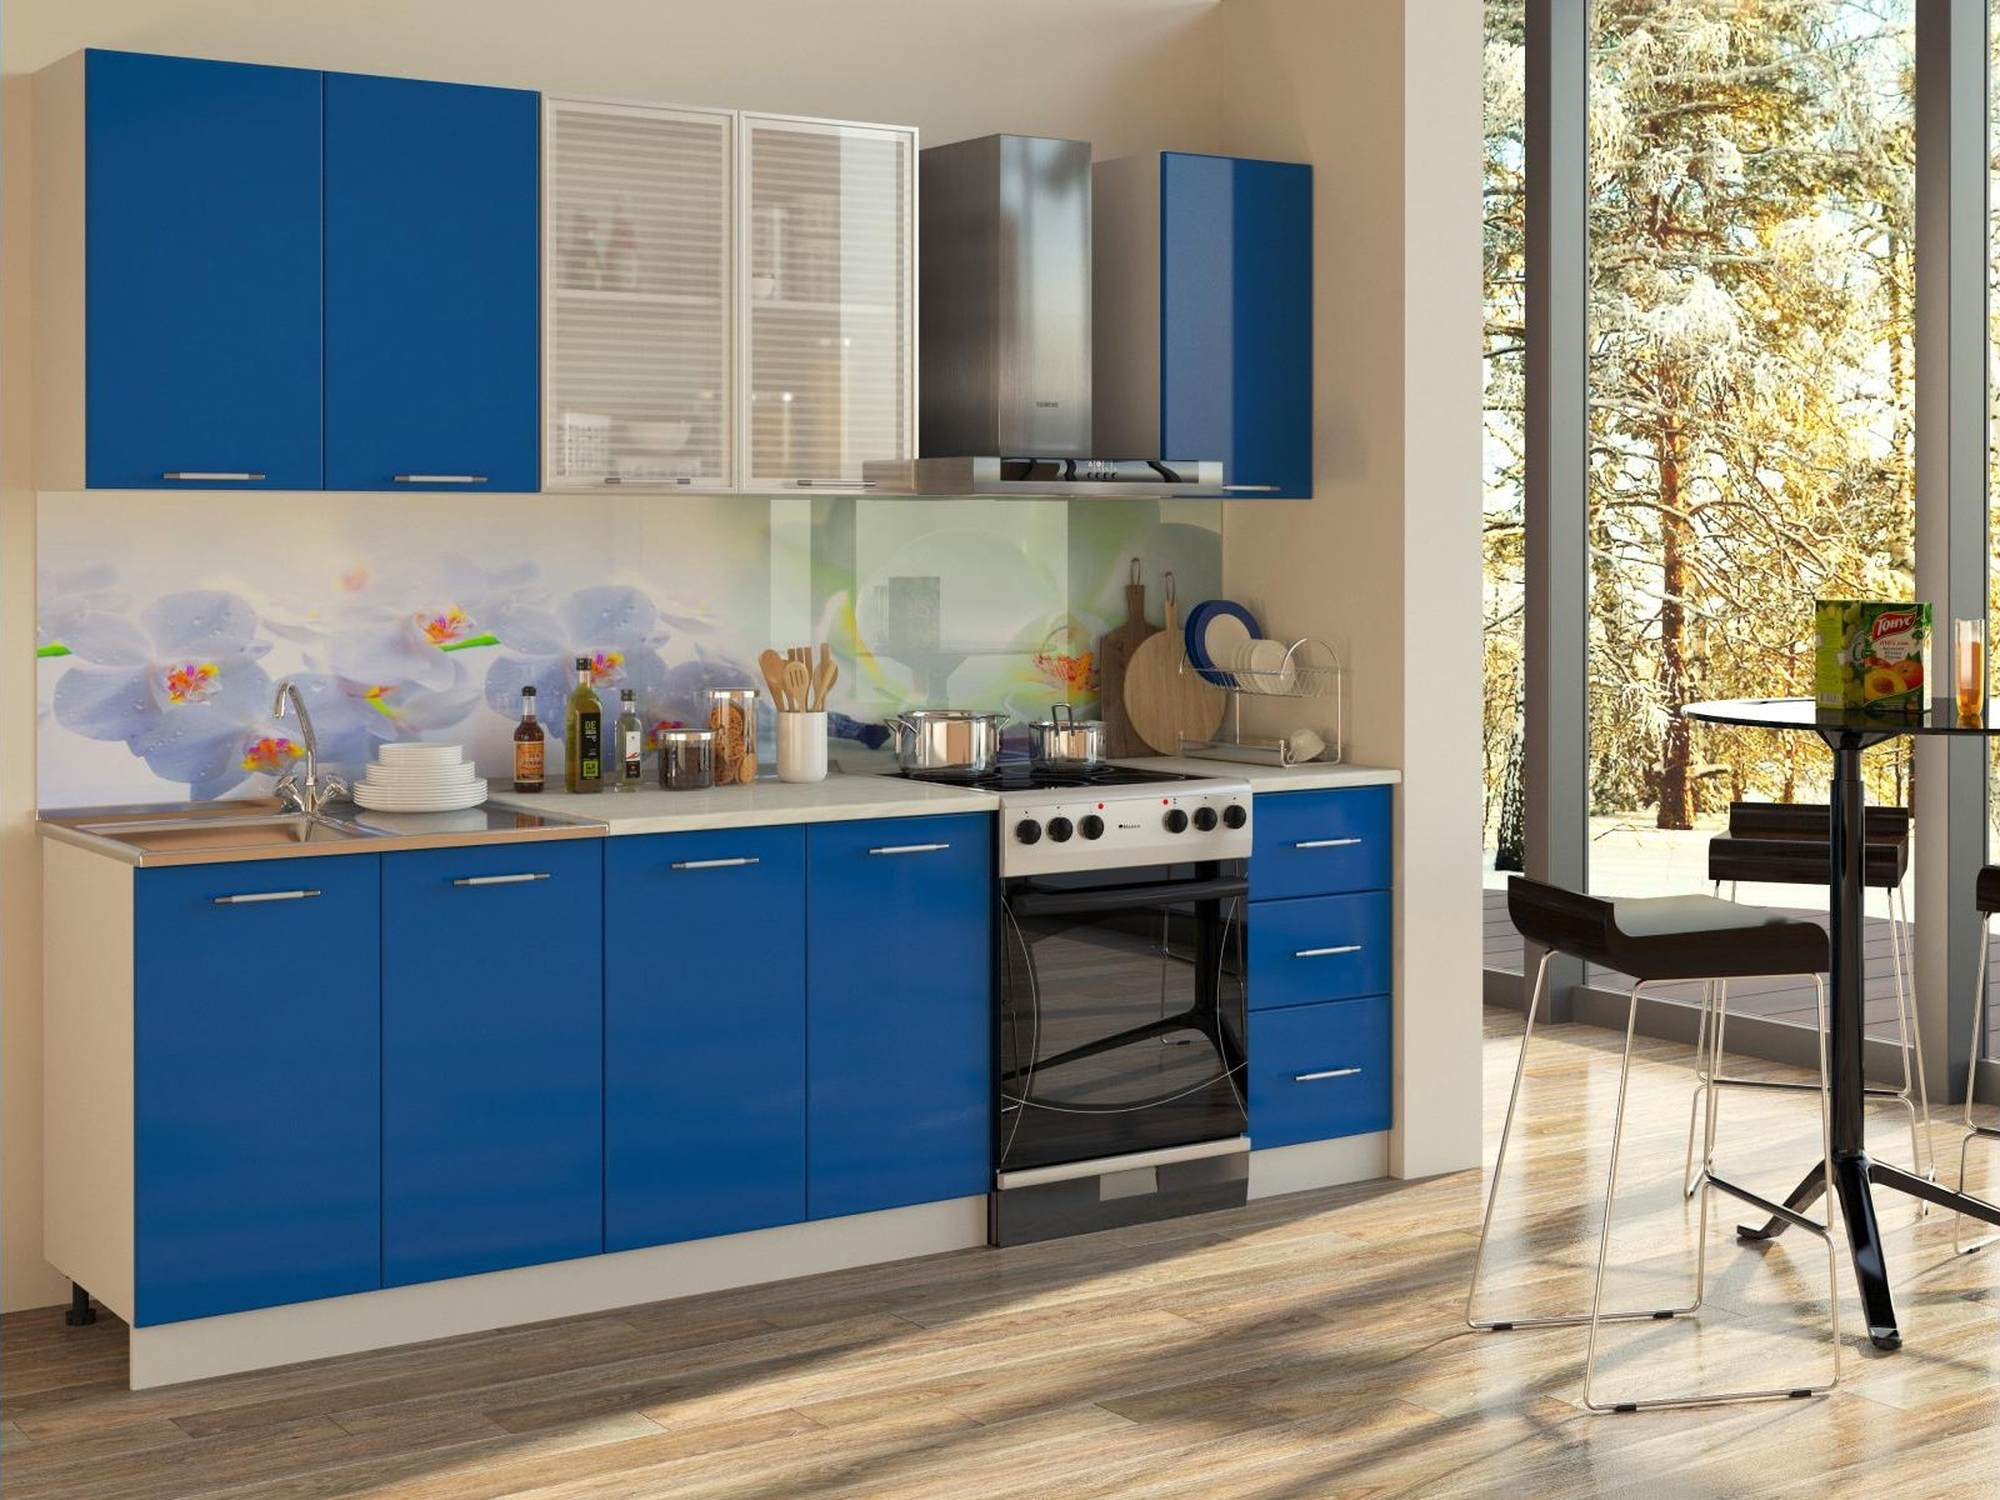 кухня с синими фасадами фото фотосессия проходила